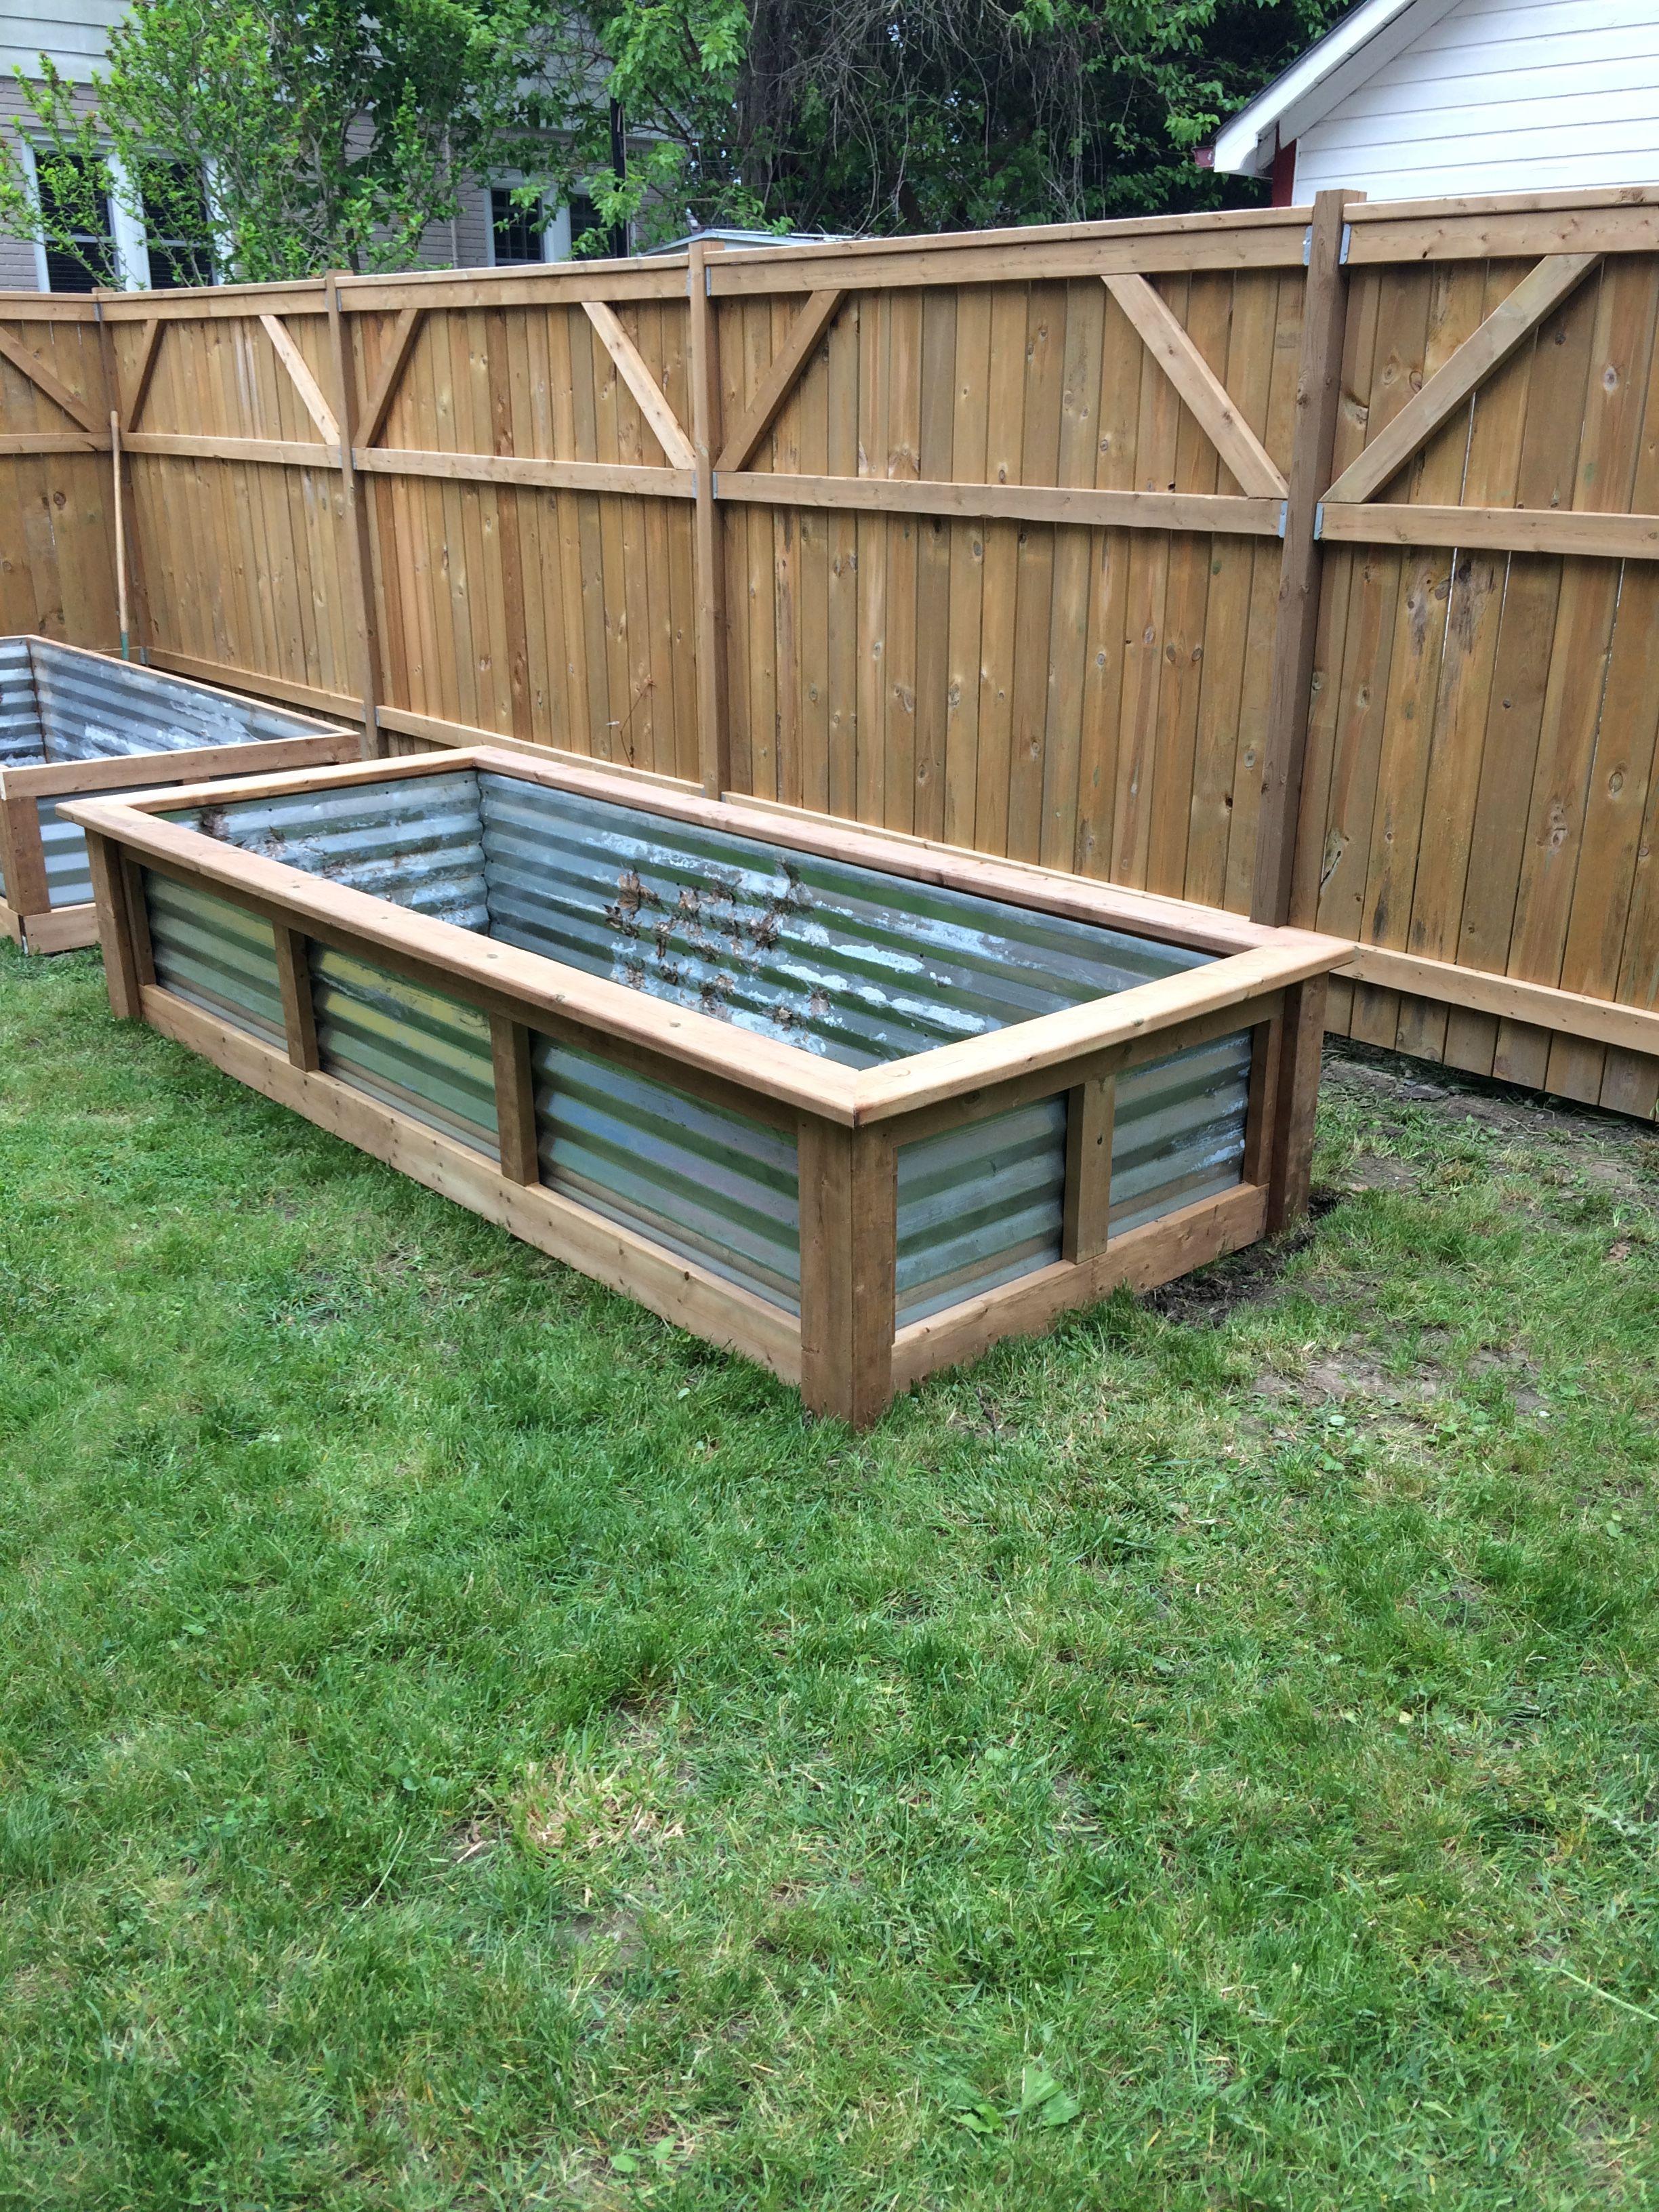 I have plans samoyed slouchy tee diy raised garden